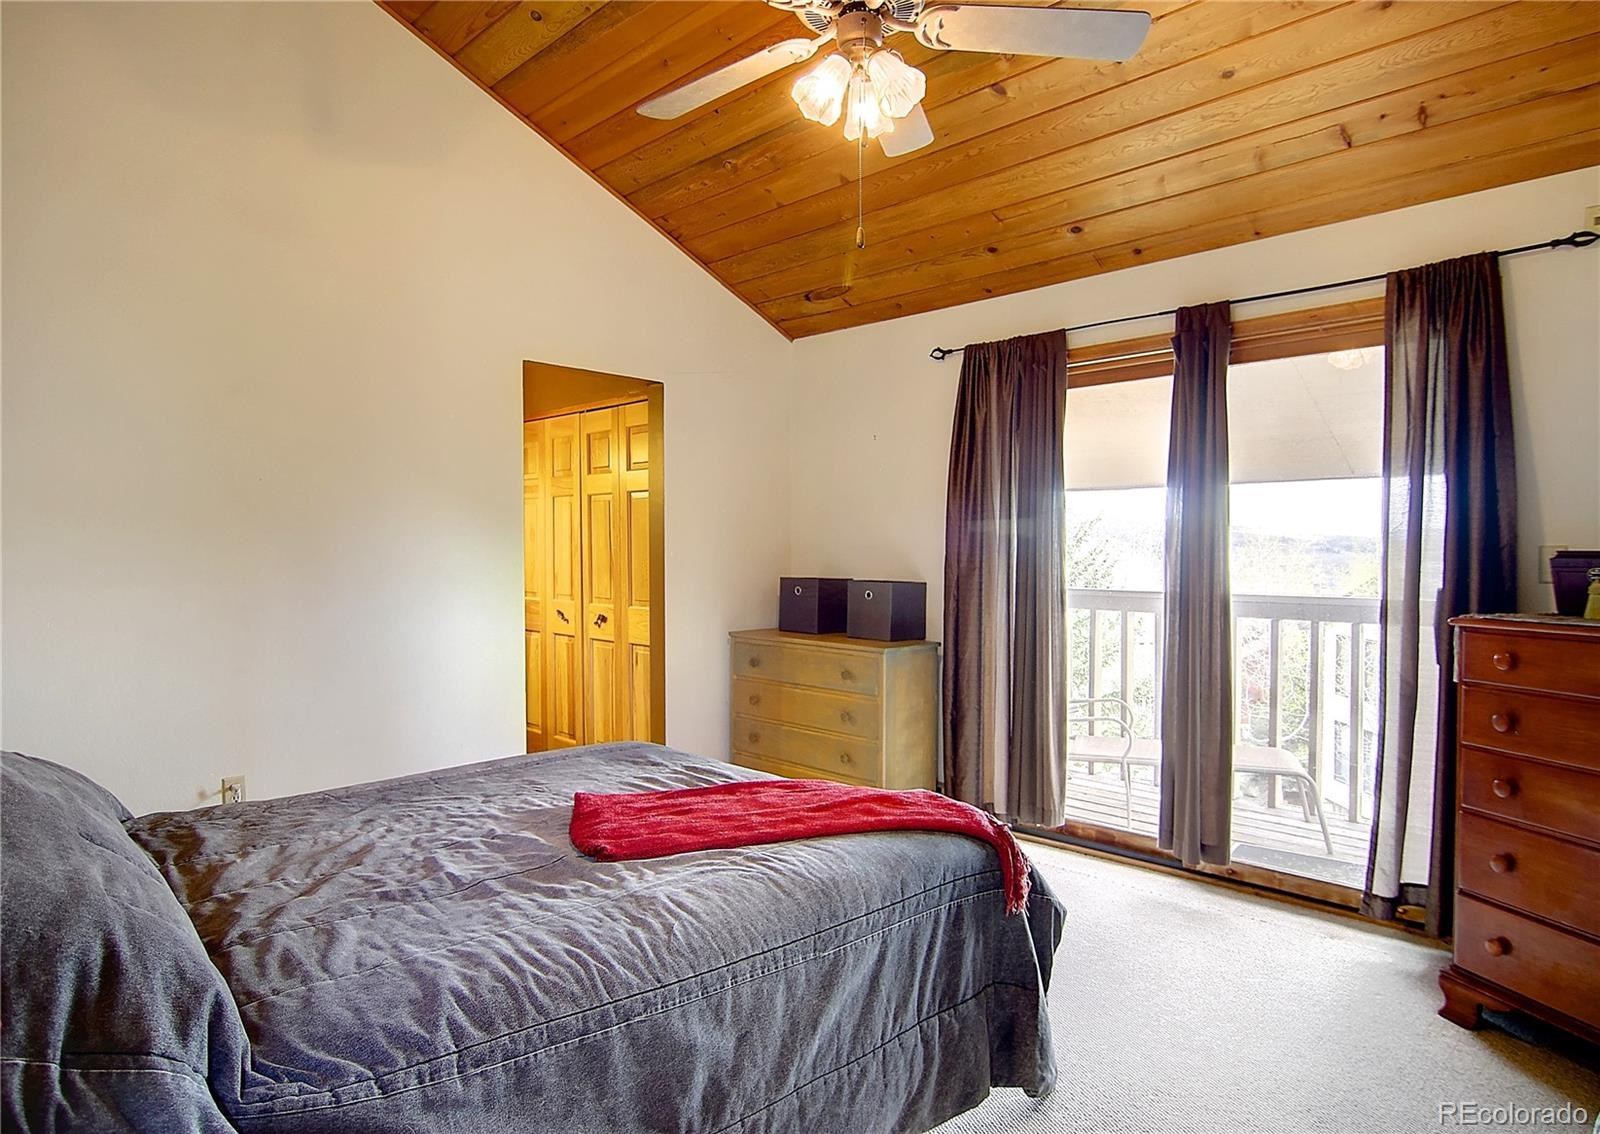 MLS# 2309963 - 11 - 1145 Overlook Drive #C1, Steamboat Springs, CO 80487